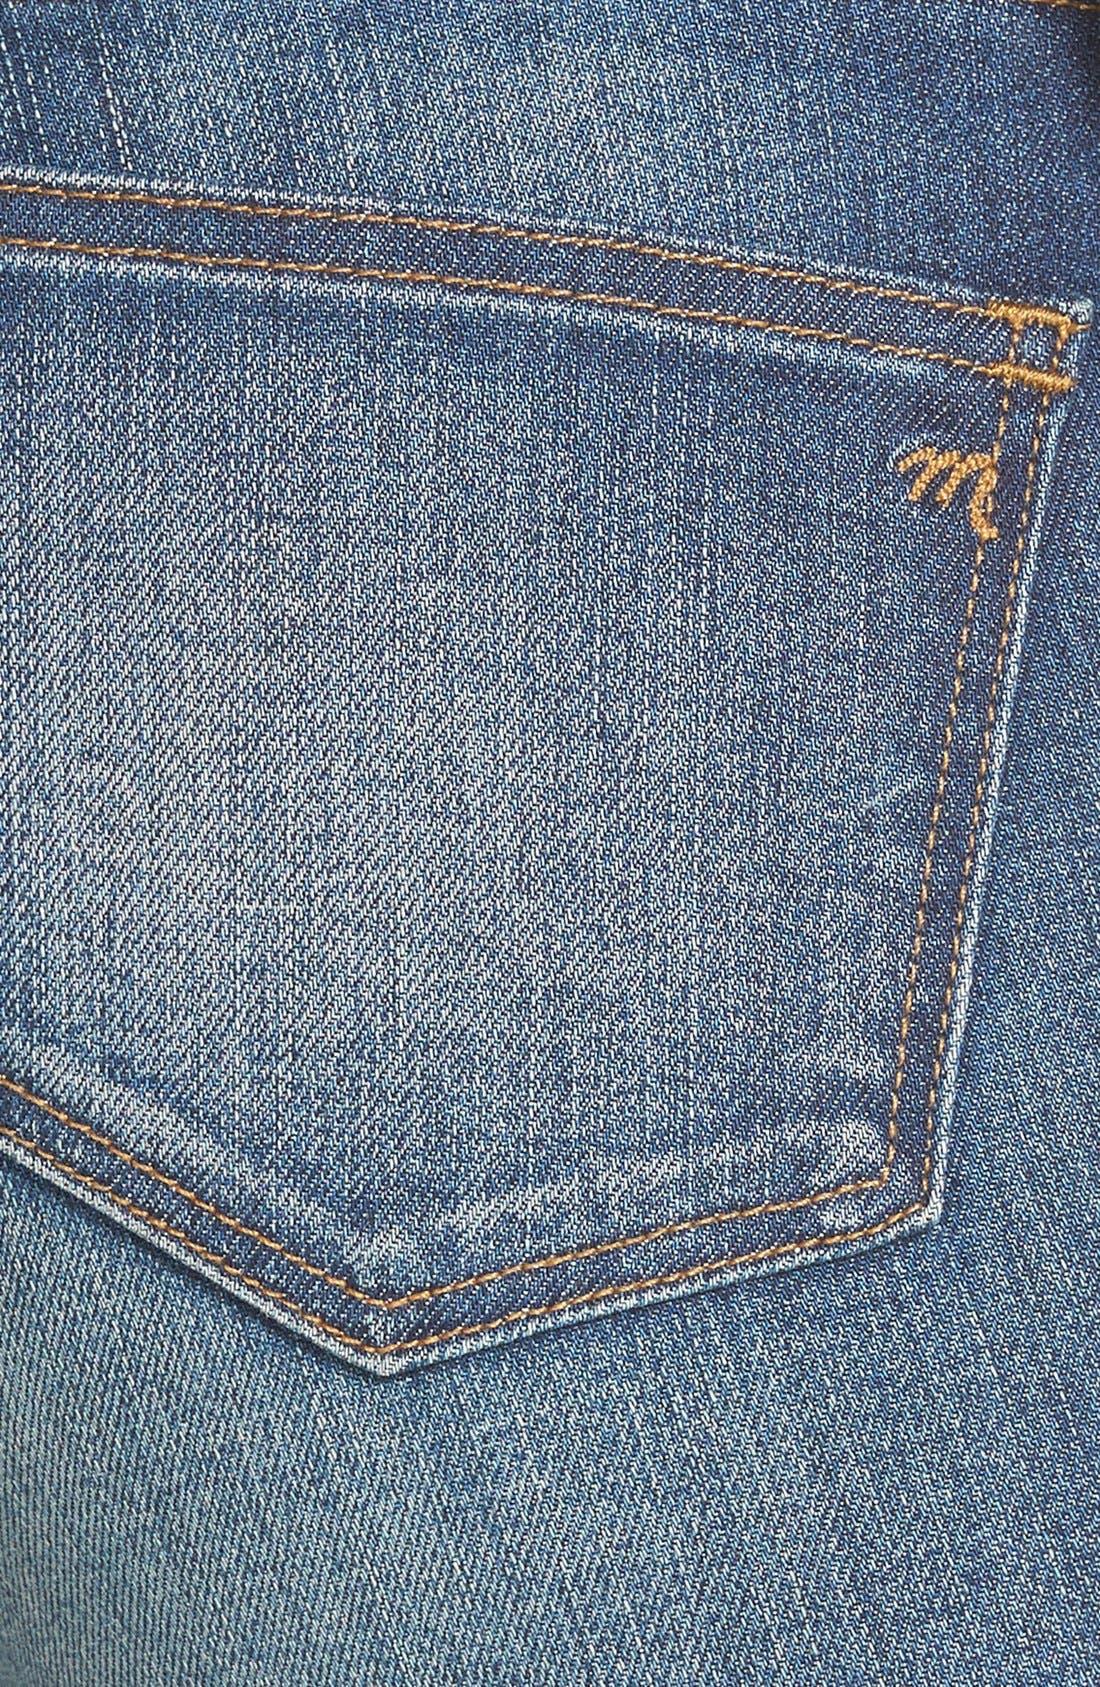 Alternate Image 3  - Madewell 'Skinny Skinny - Taller' Jeans (Edmonton Wash) (Long)